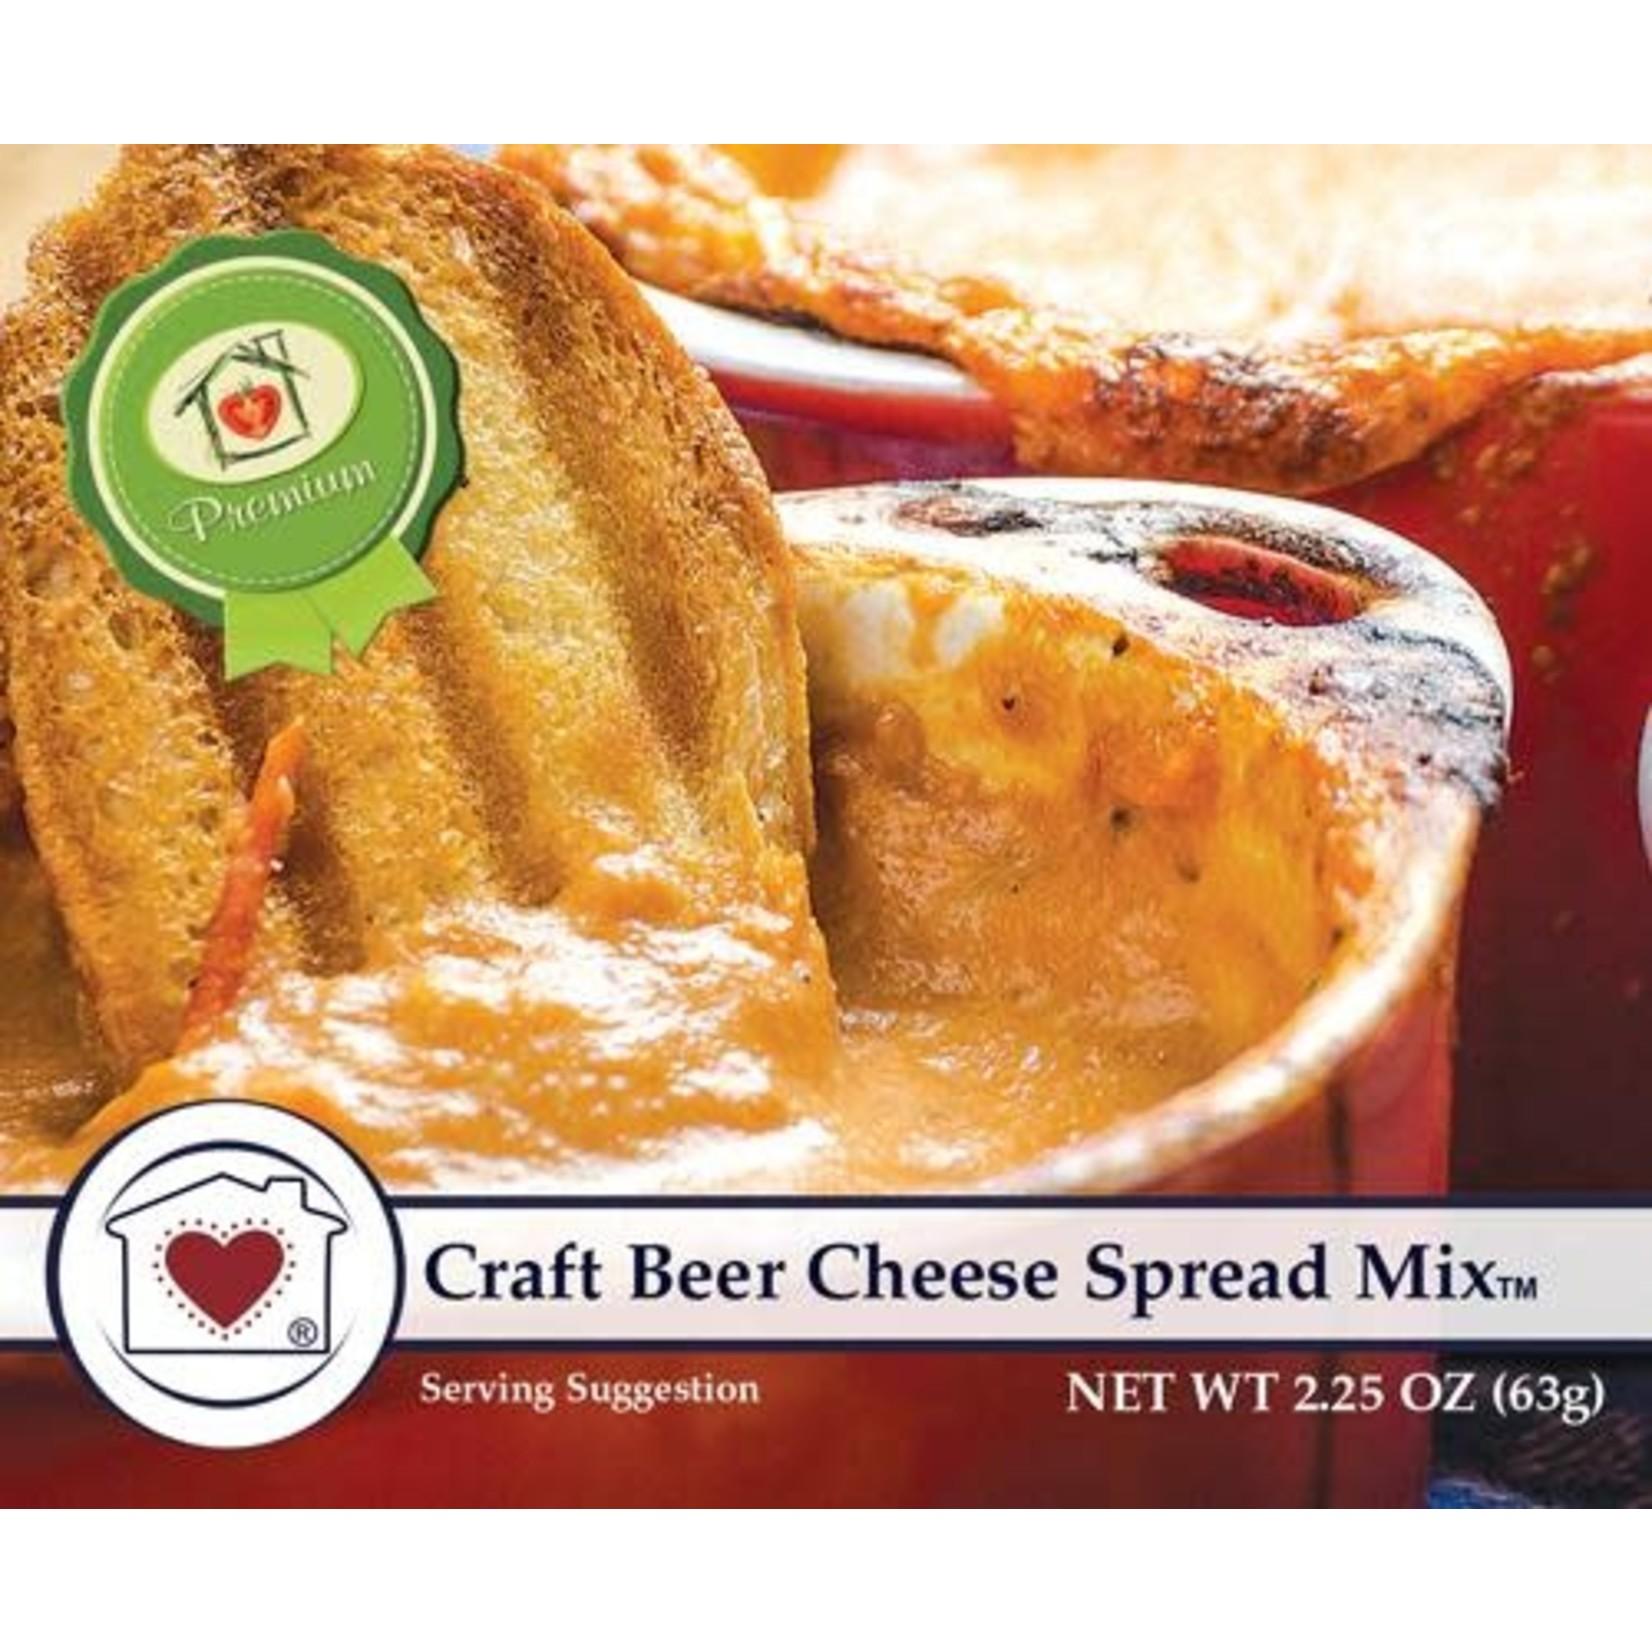 CRAFT BEER CHEESE MIX DIP